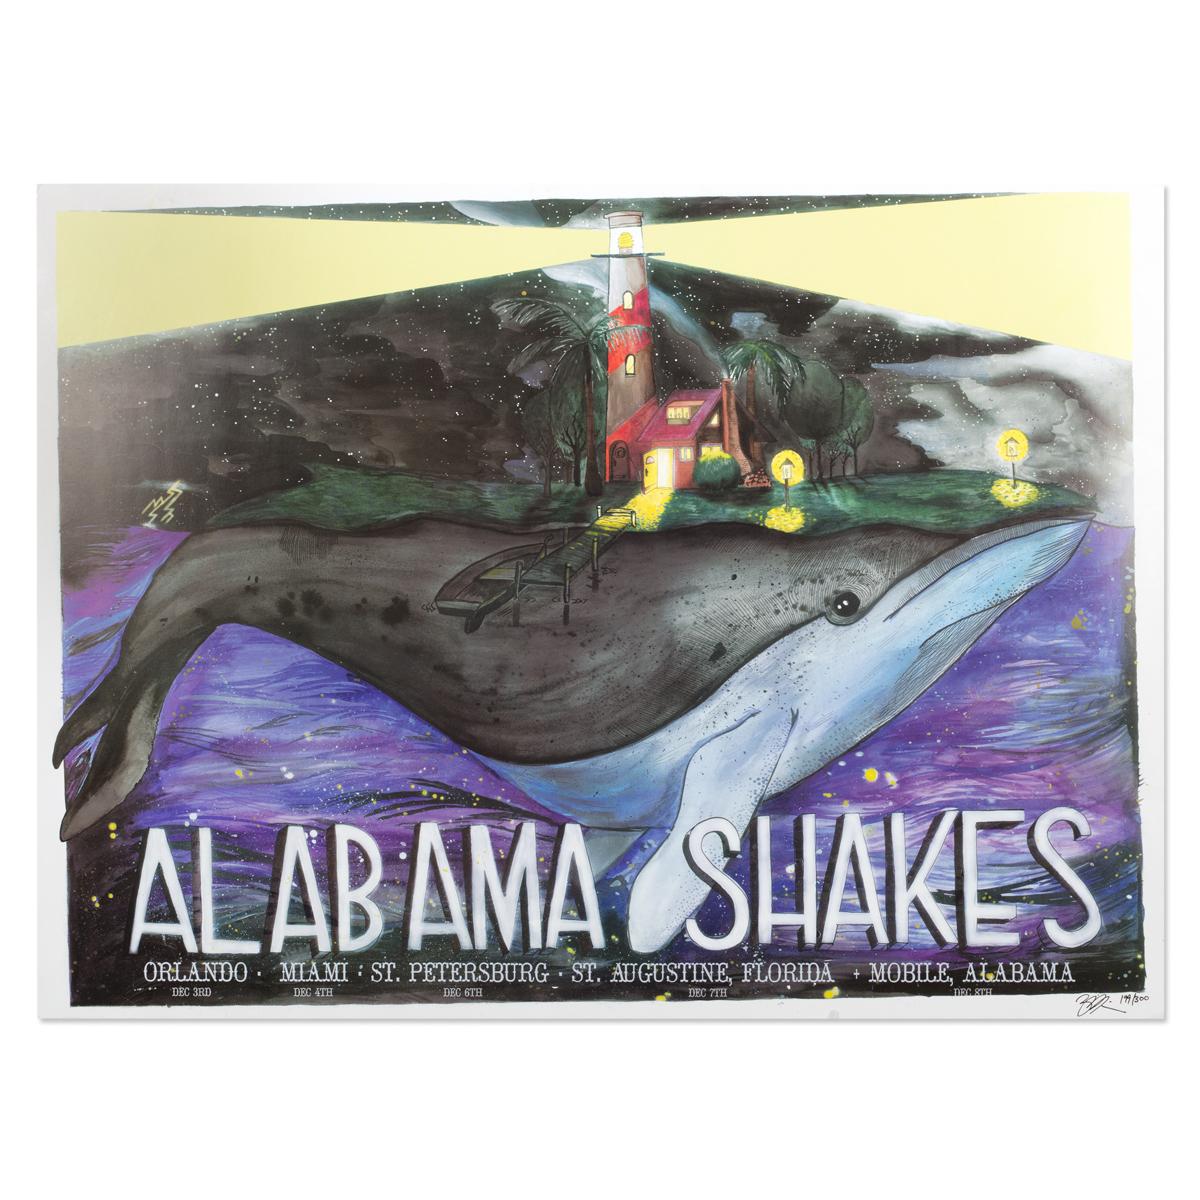 Alabama Shakes December 2013 Tour Poster